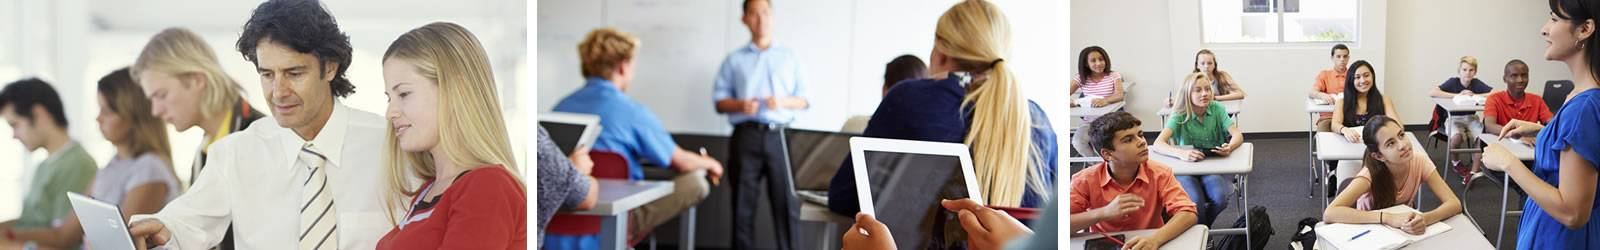 teachers in-training